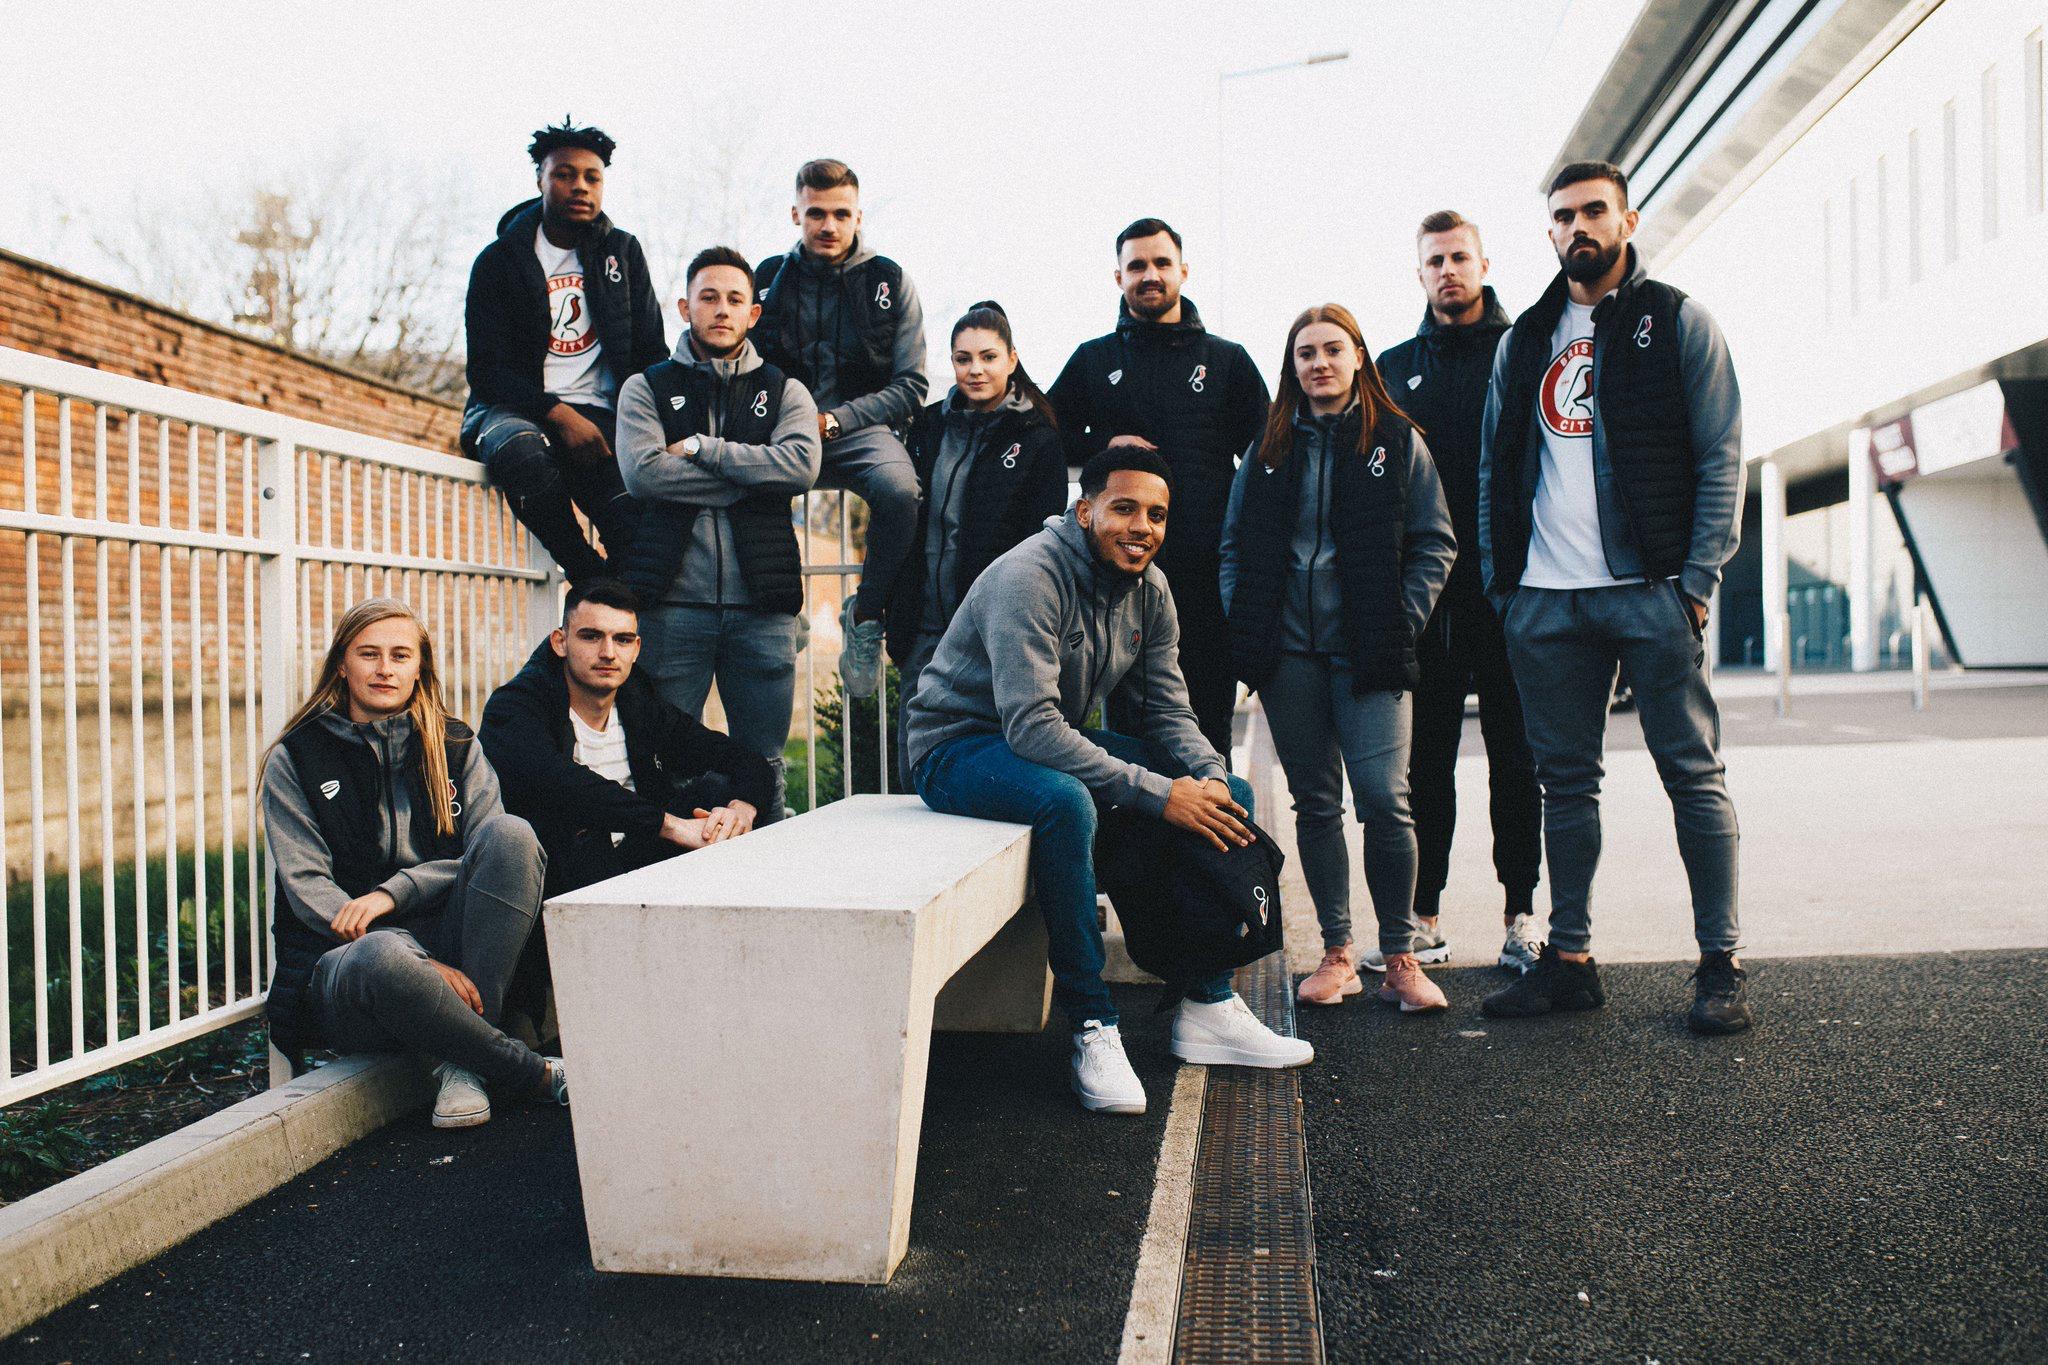 Bristol City Men's and Women's side unveil their new sportswear range.